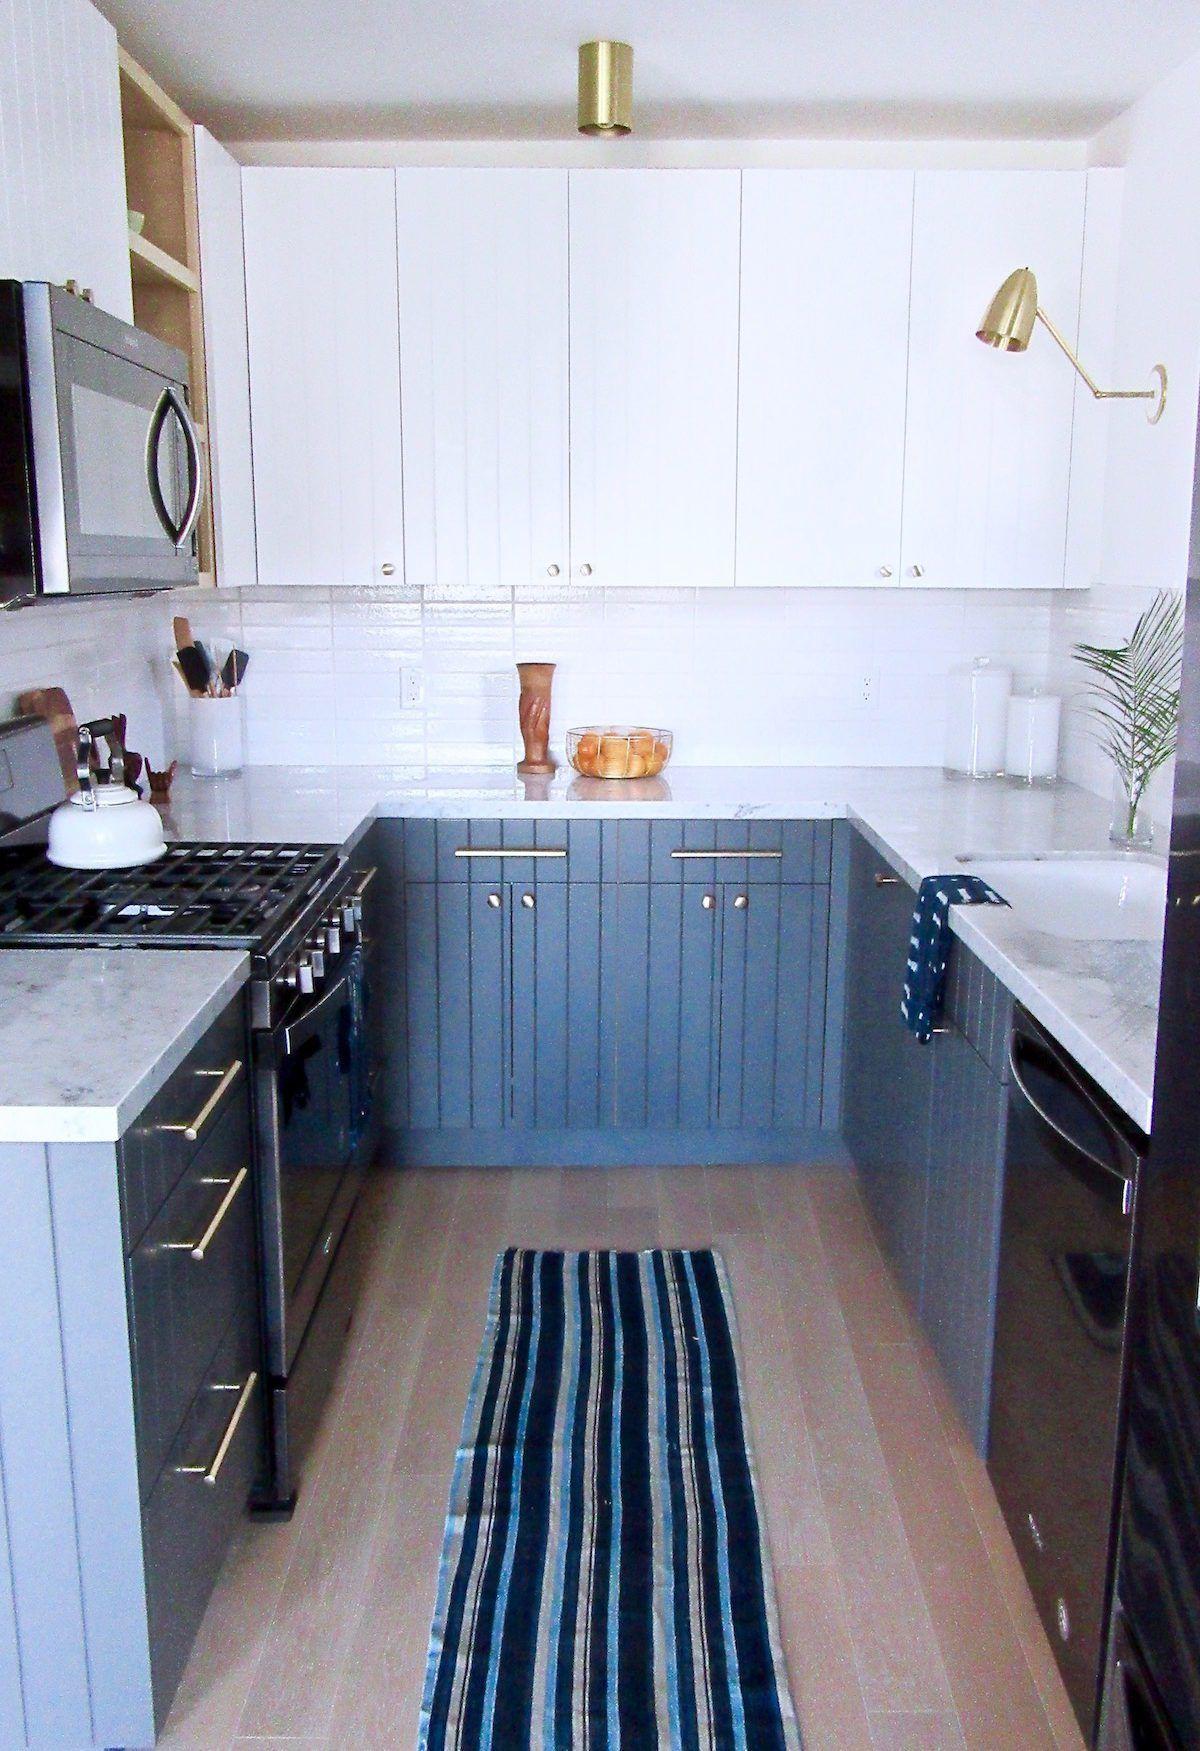 Silver Lake Small Kitchen Remodel - Black Appliance Trend | Black ...